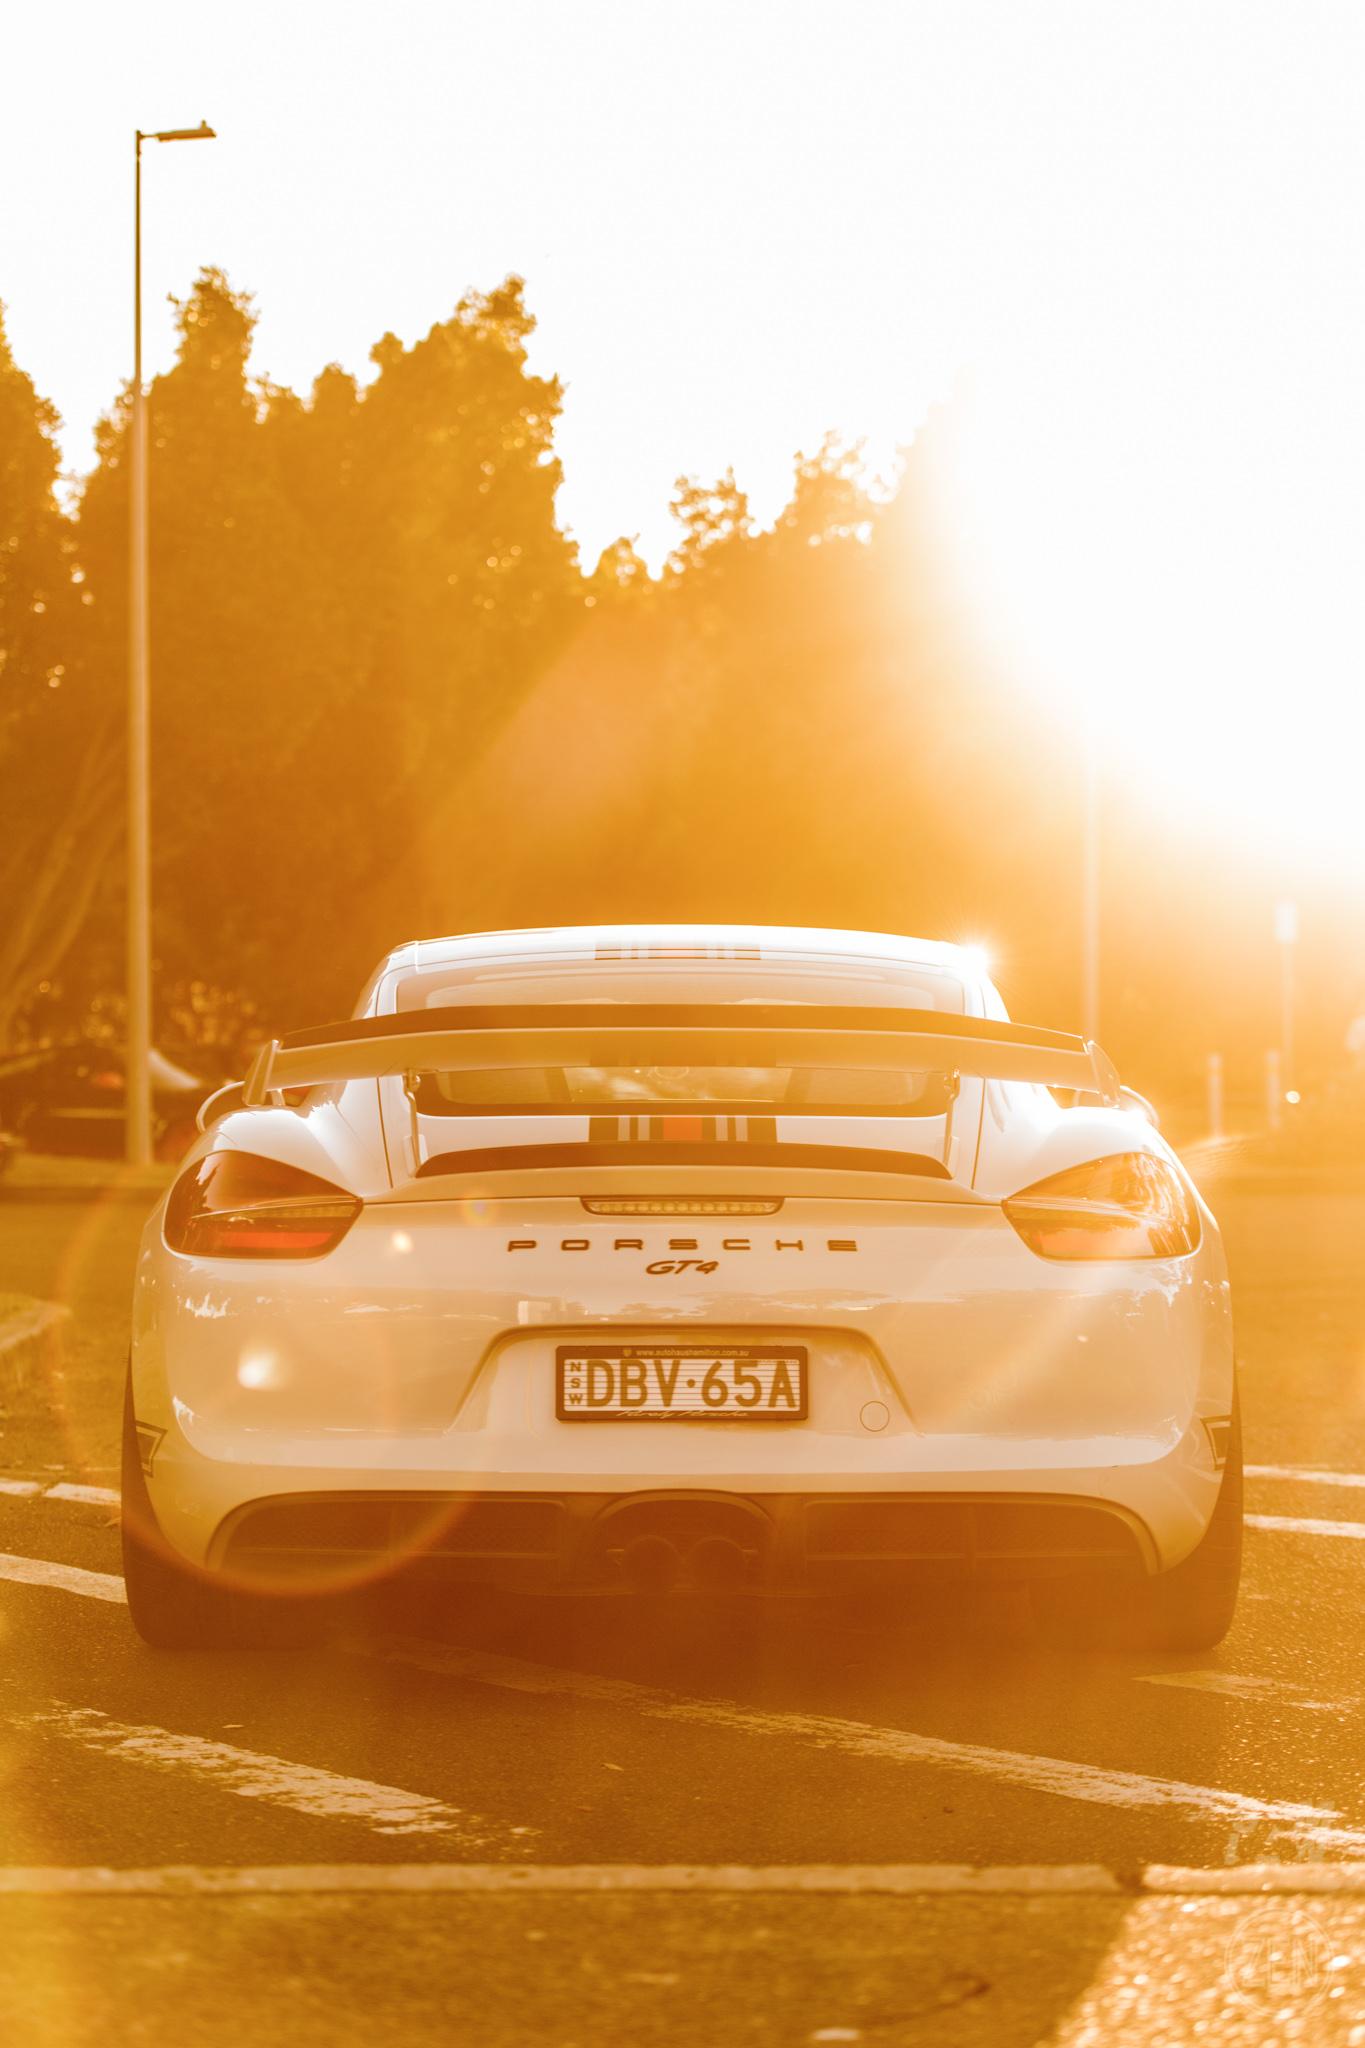 2019-10-27 - Autohaus Porsches & Coffee 028